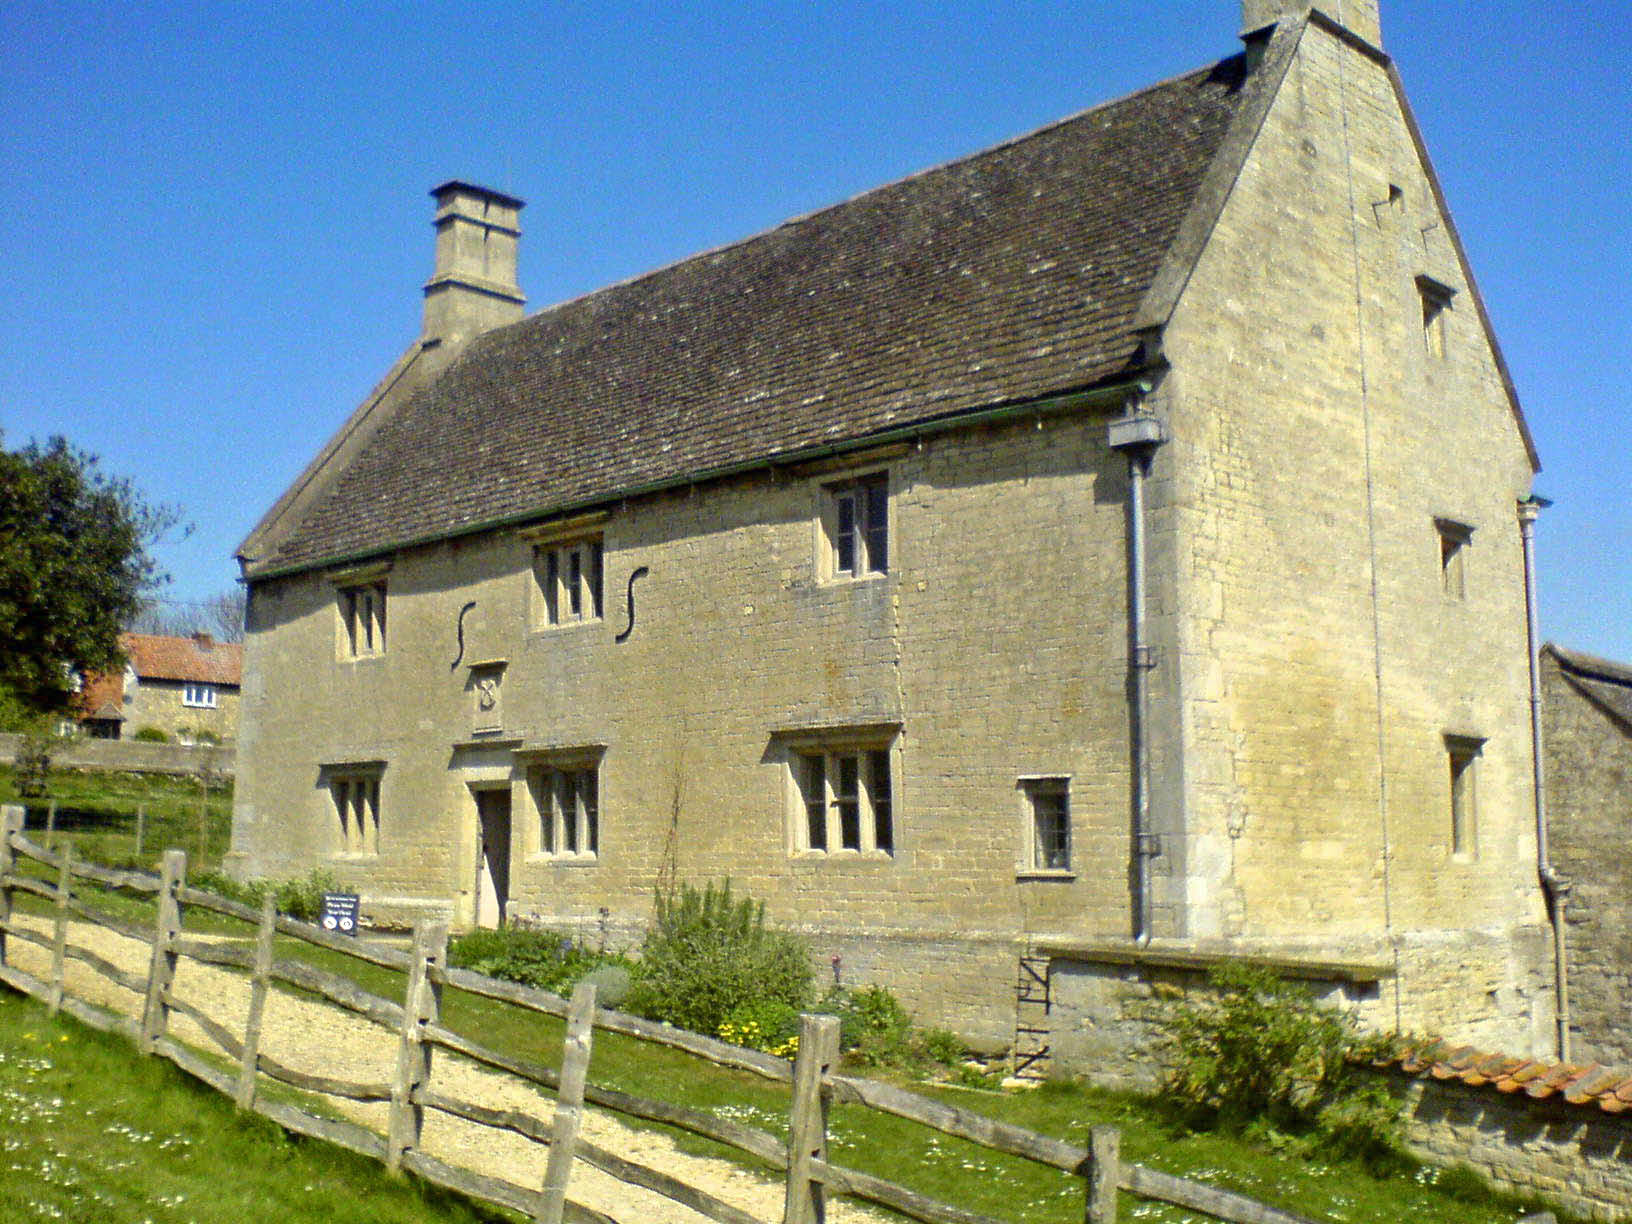 Sir Isaac Newton's Birthplace